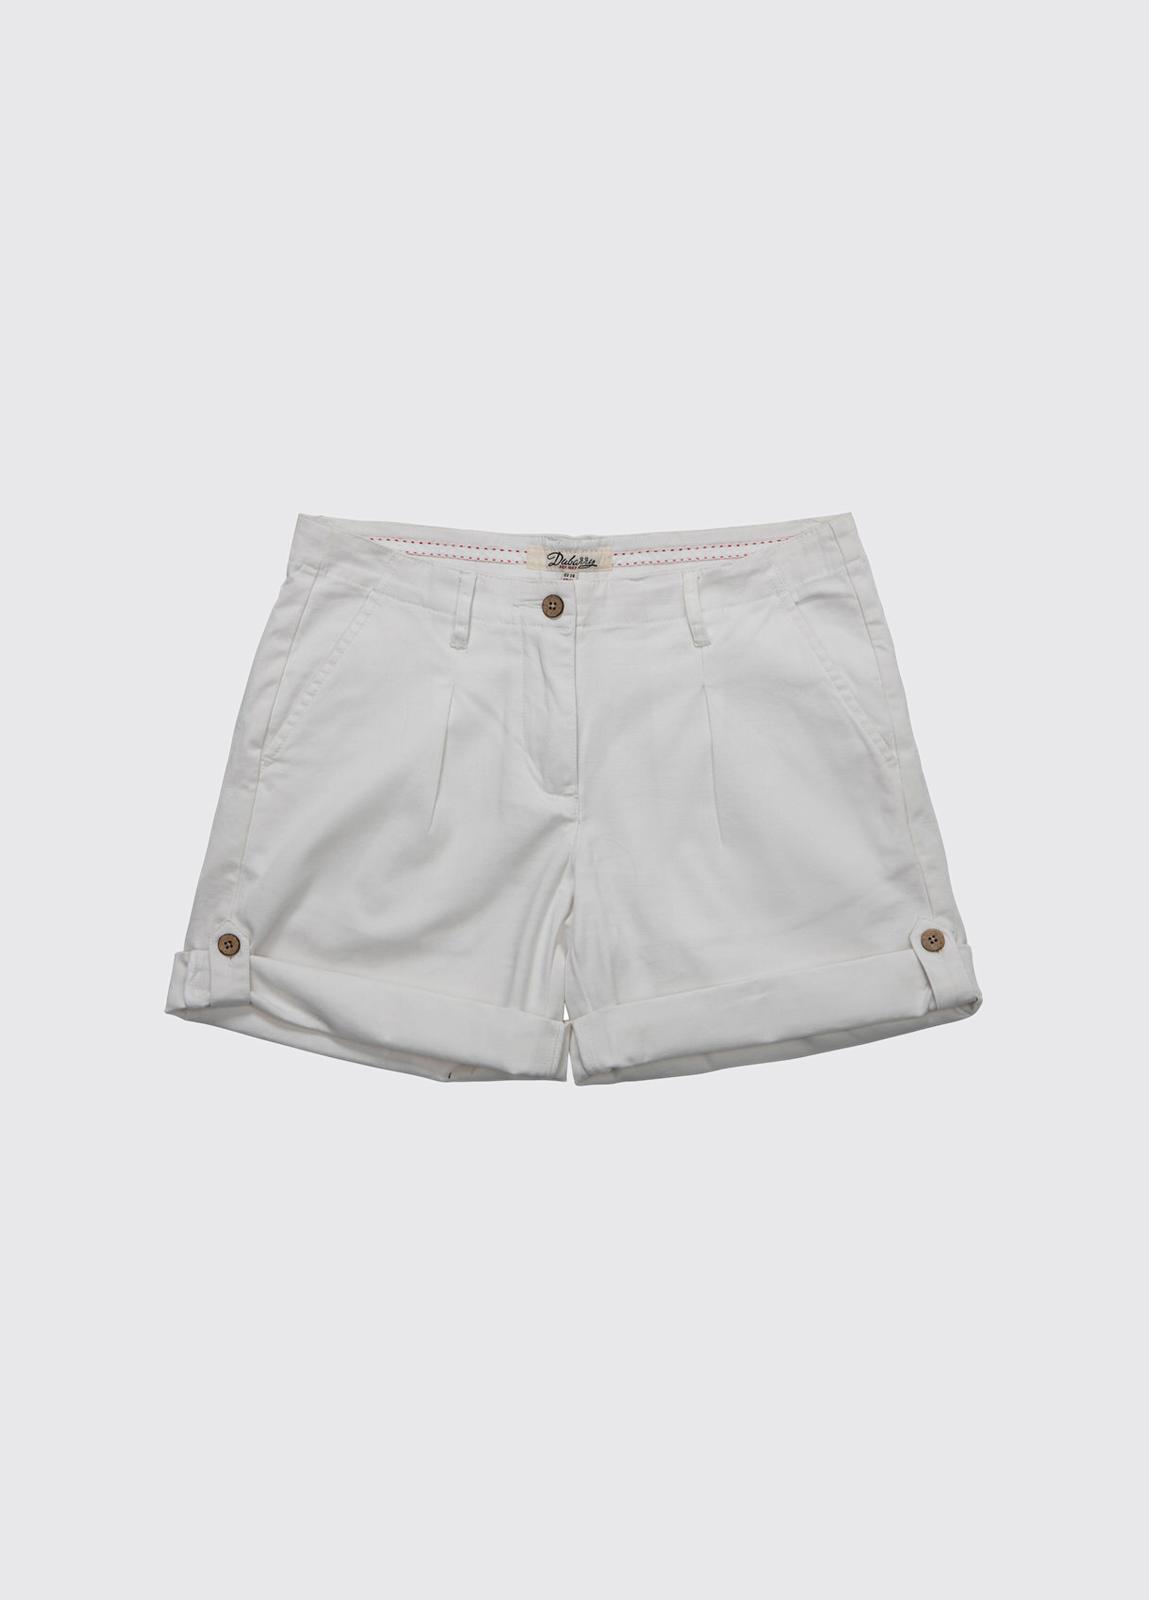 Summerhill ladies shorts - White